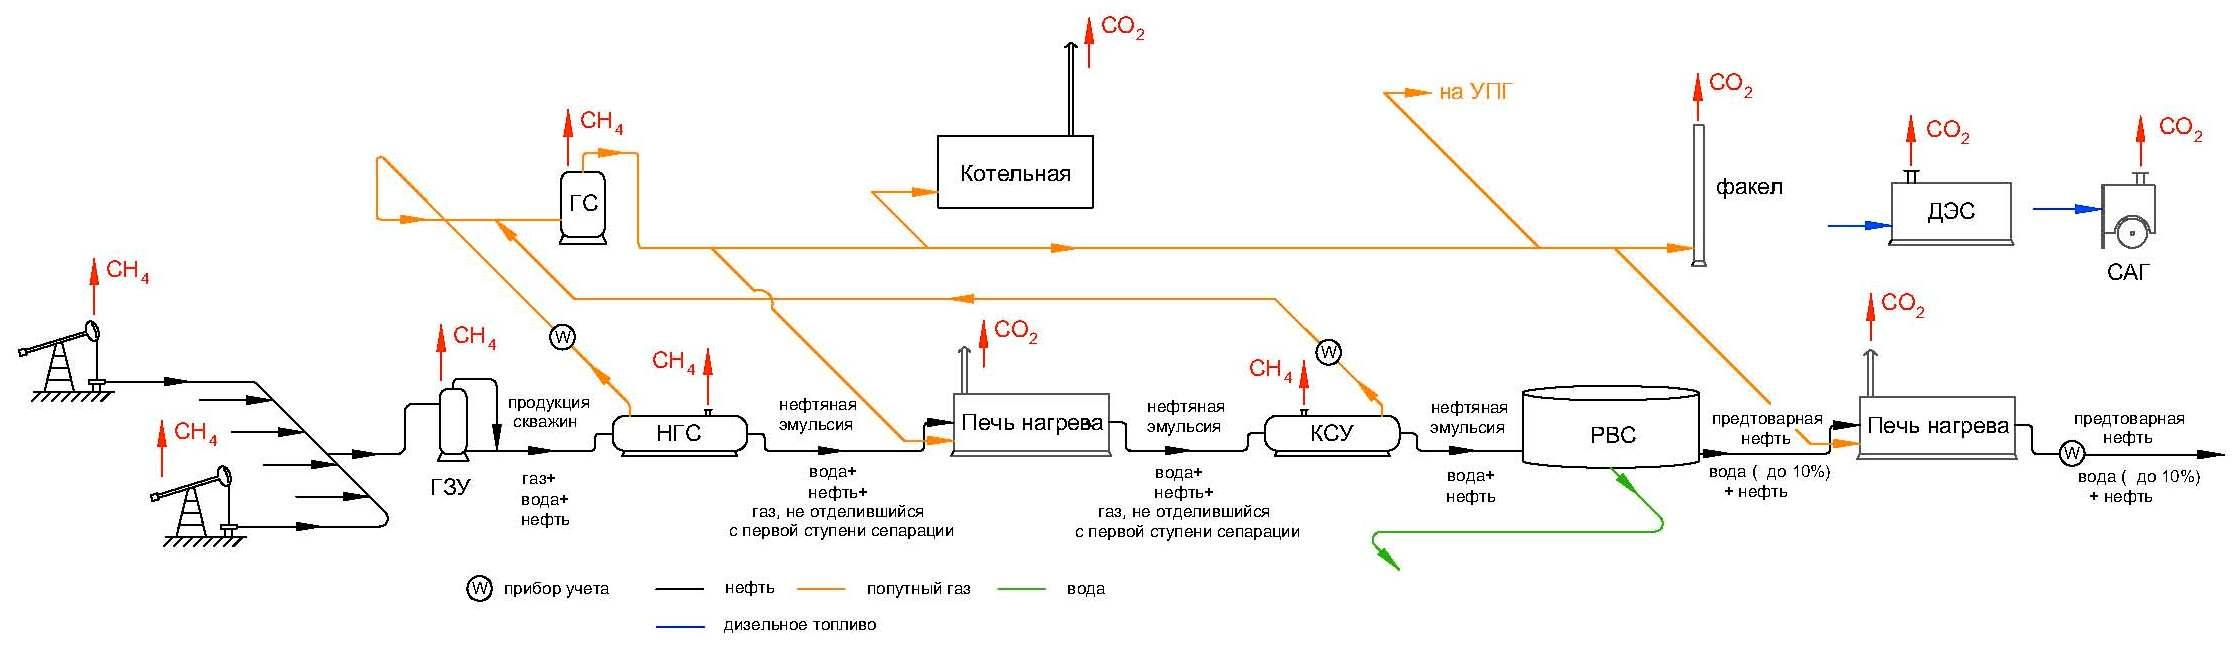 Установка подготовки газа схема